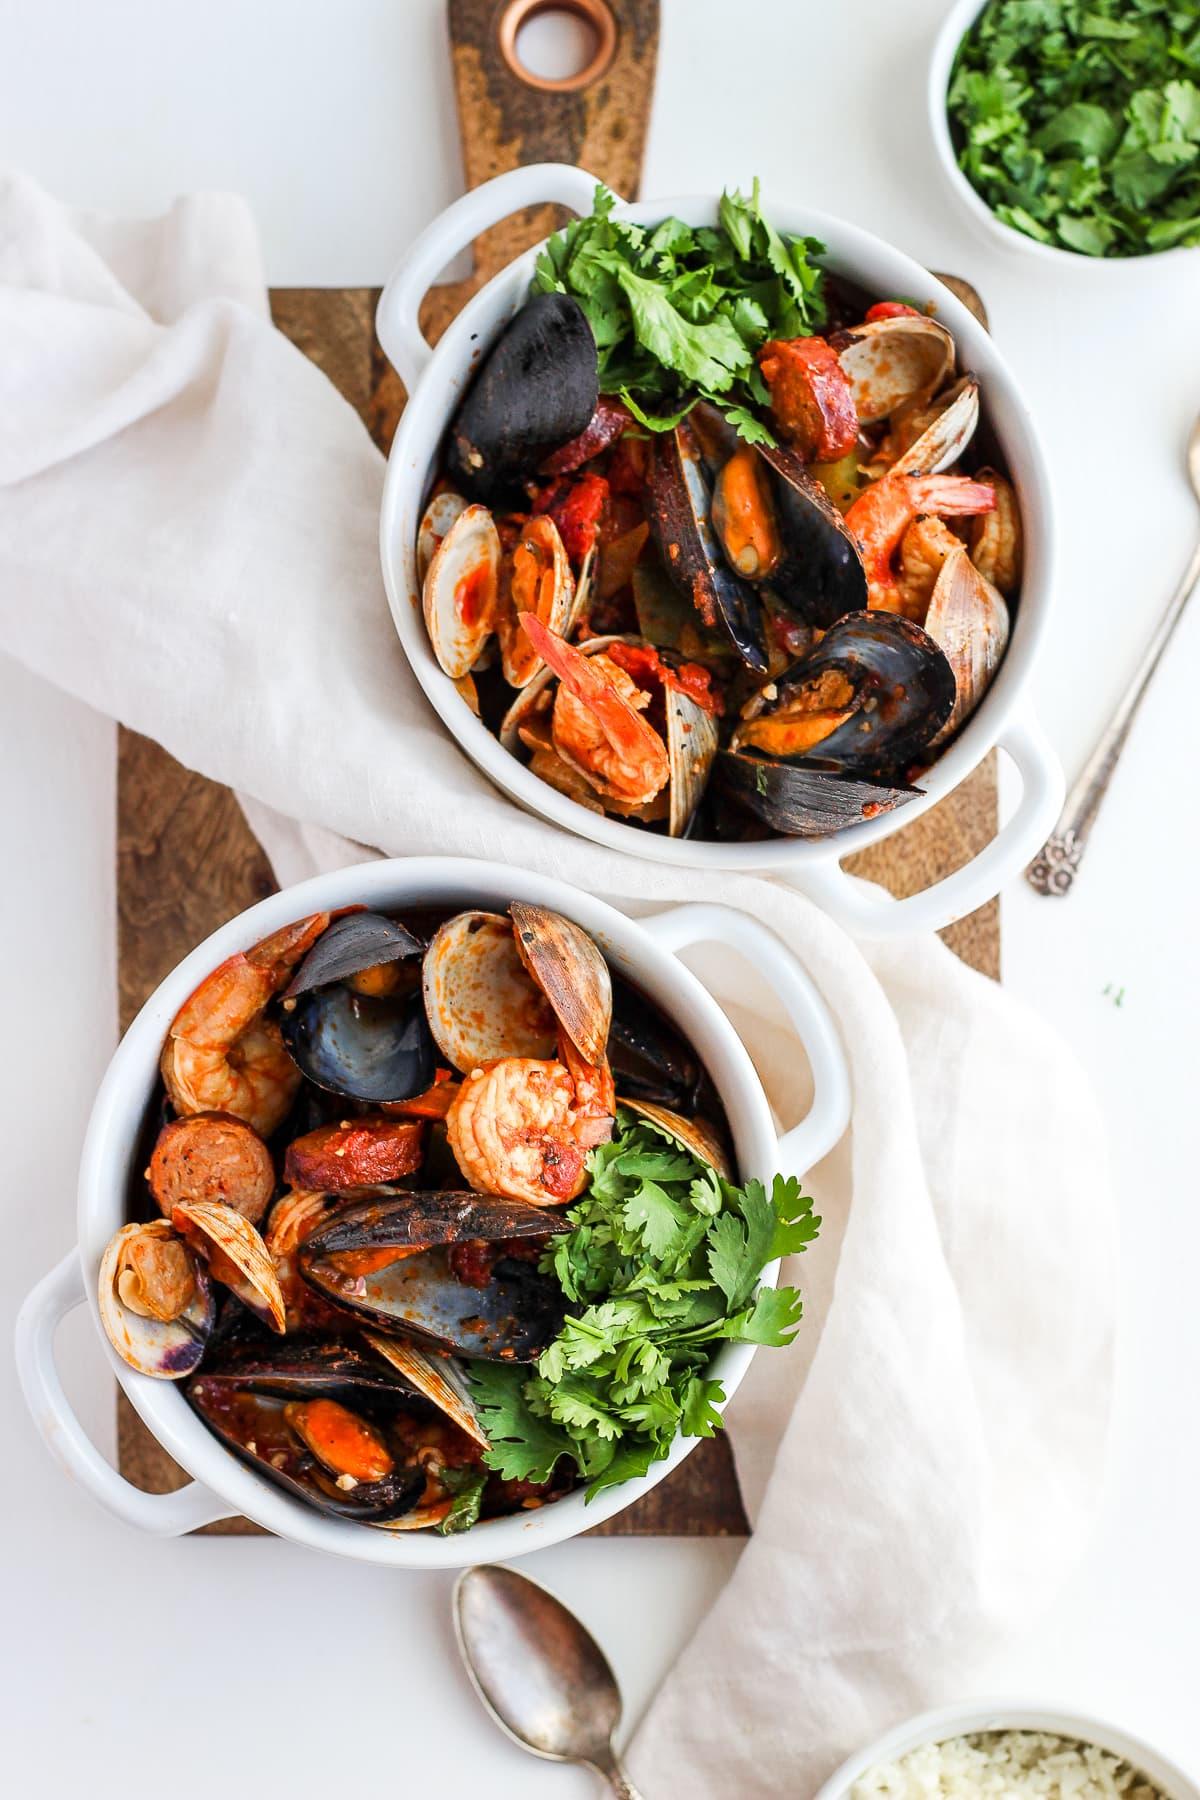 Seafood and Chorizo Wannabe Paella - a whole30/paleo version of your classic paella dish! #whole30 #paleo